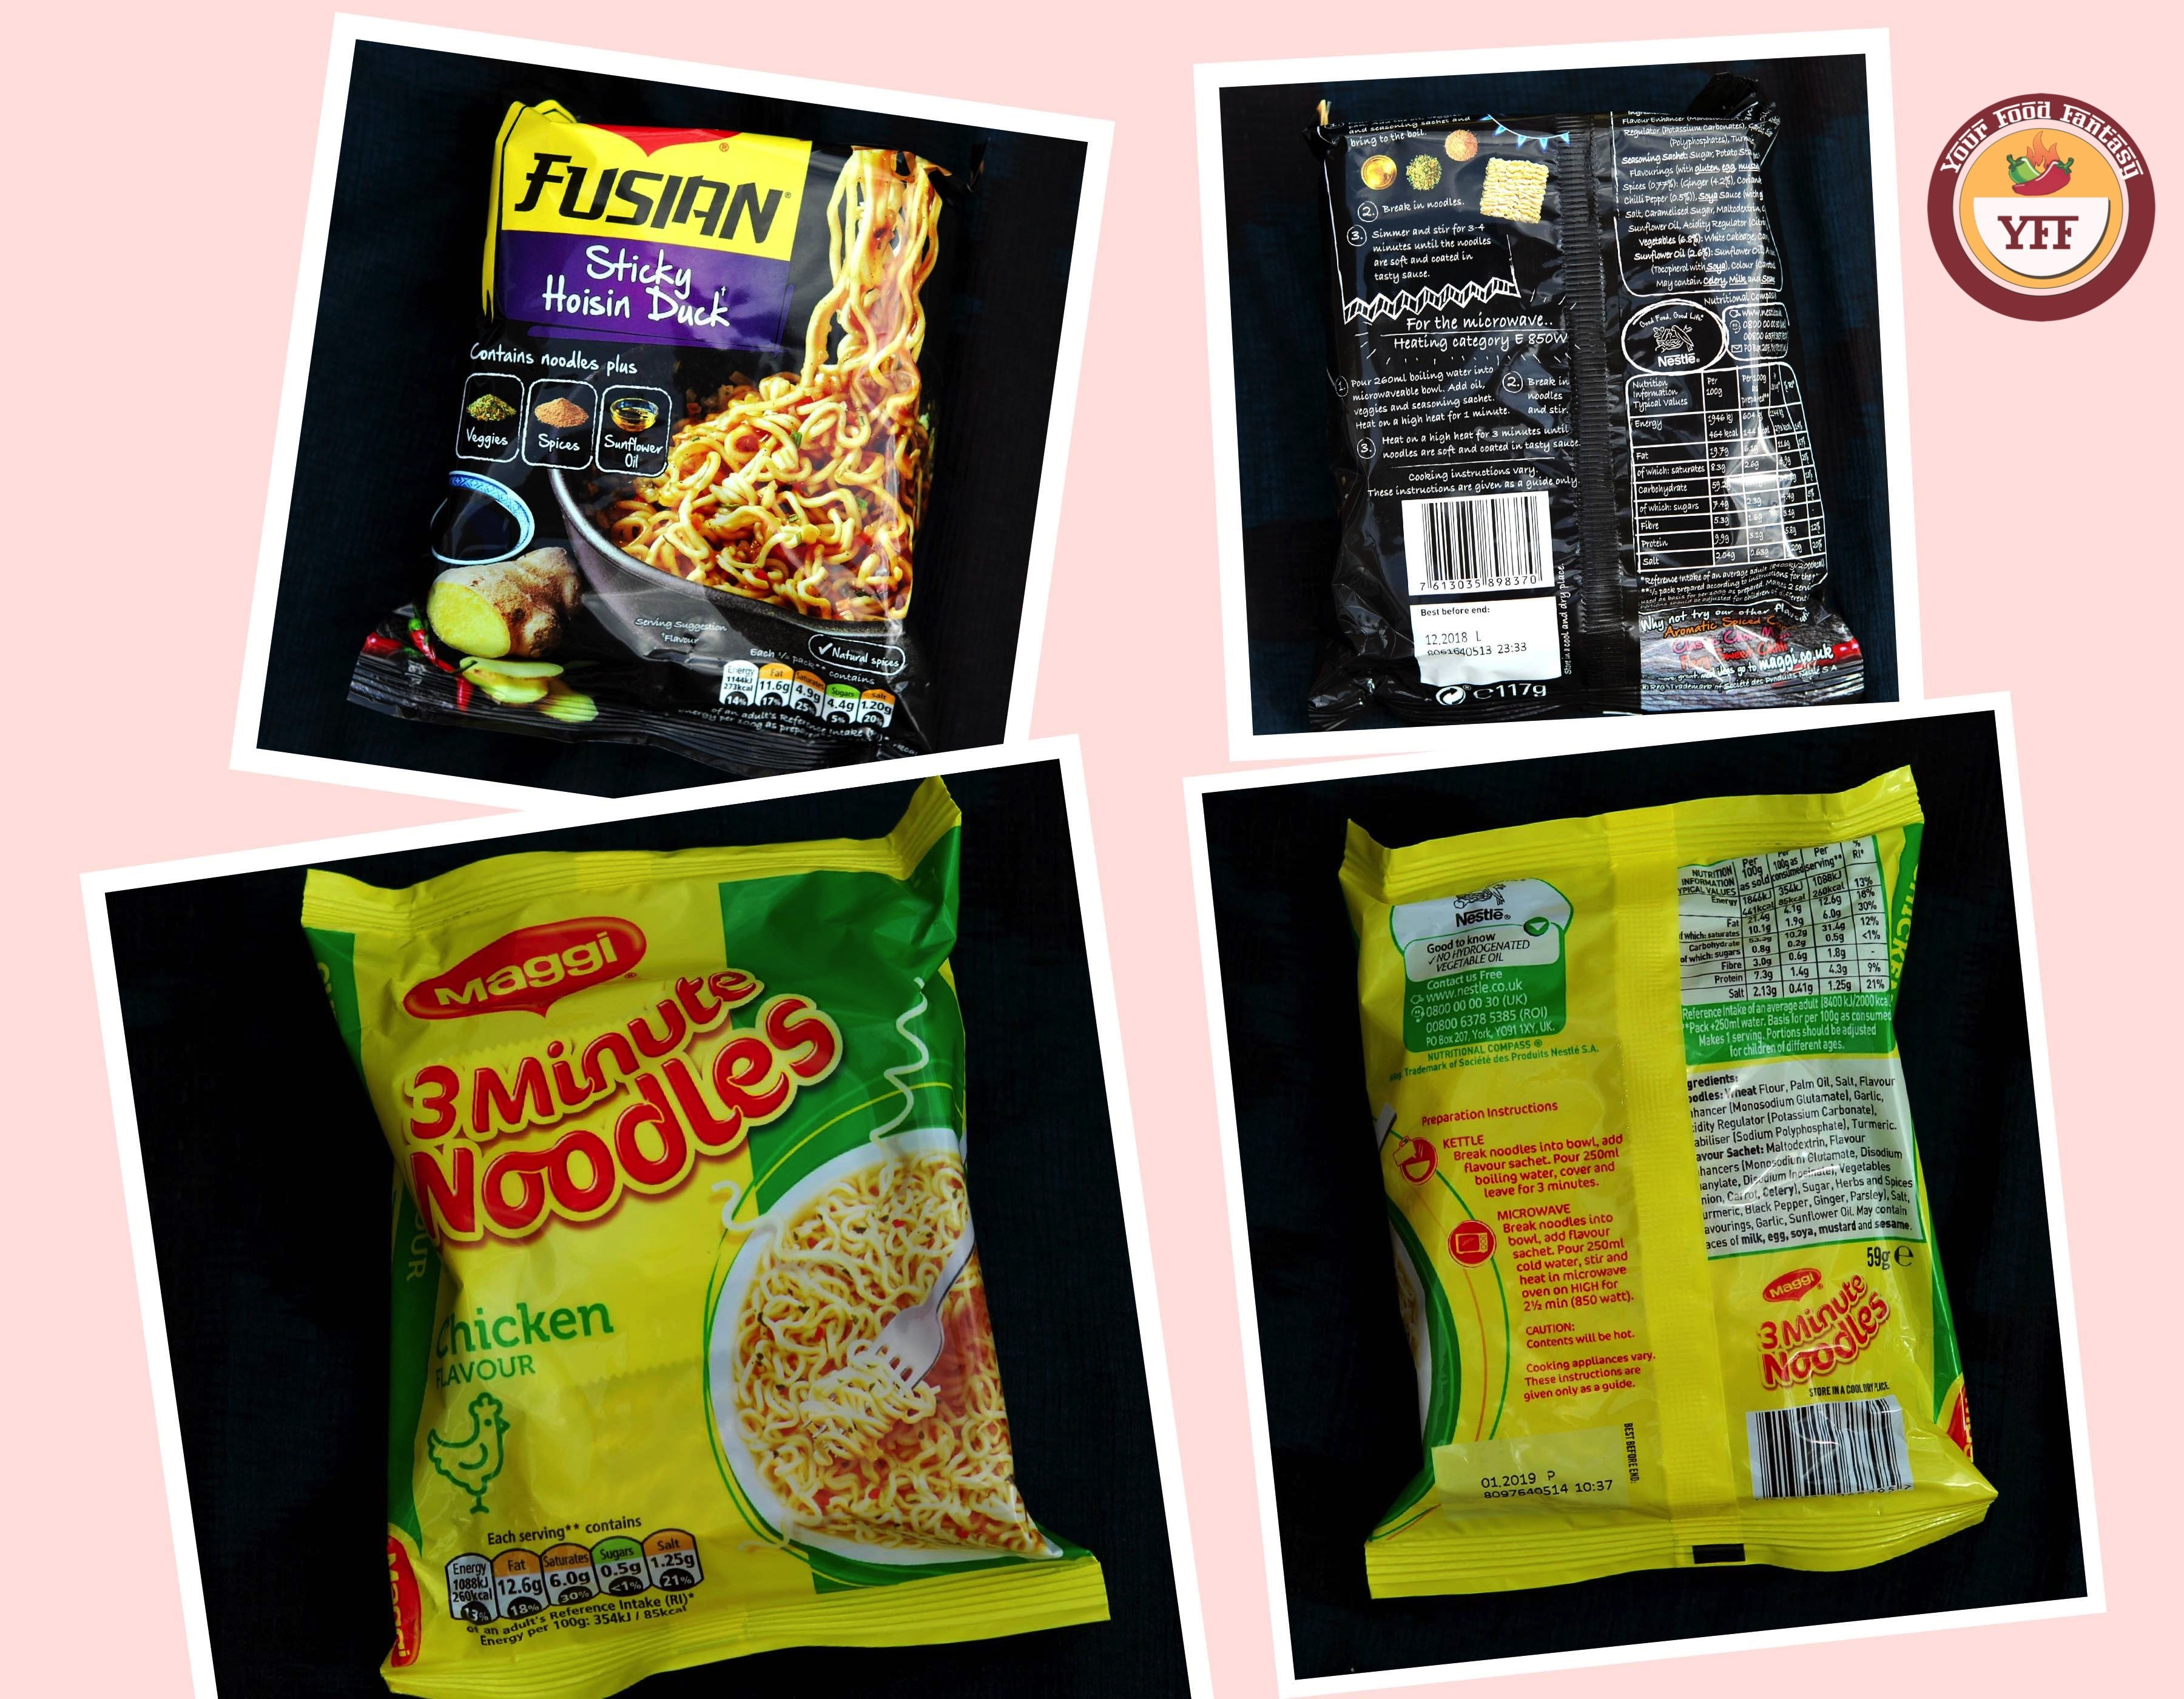 Maggi Noodles Review - Degustabox